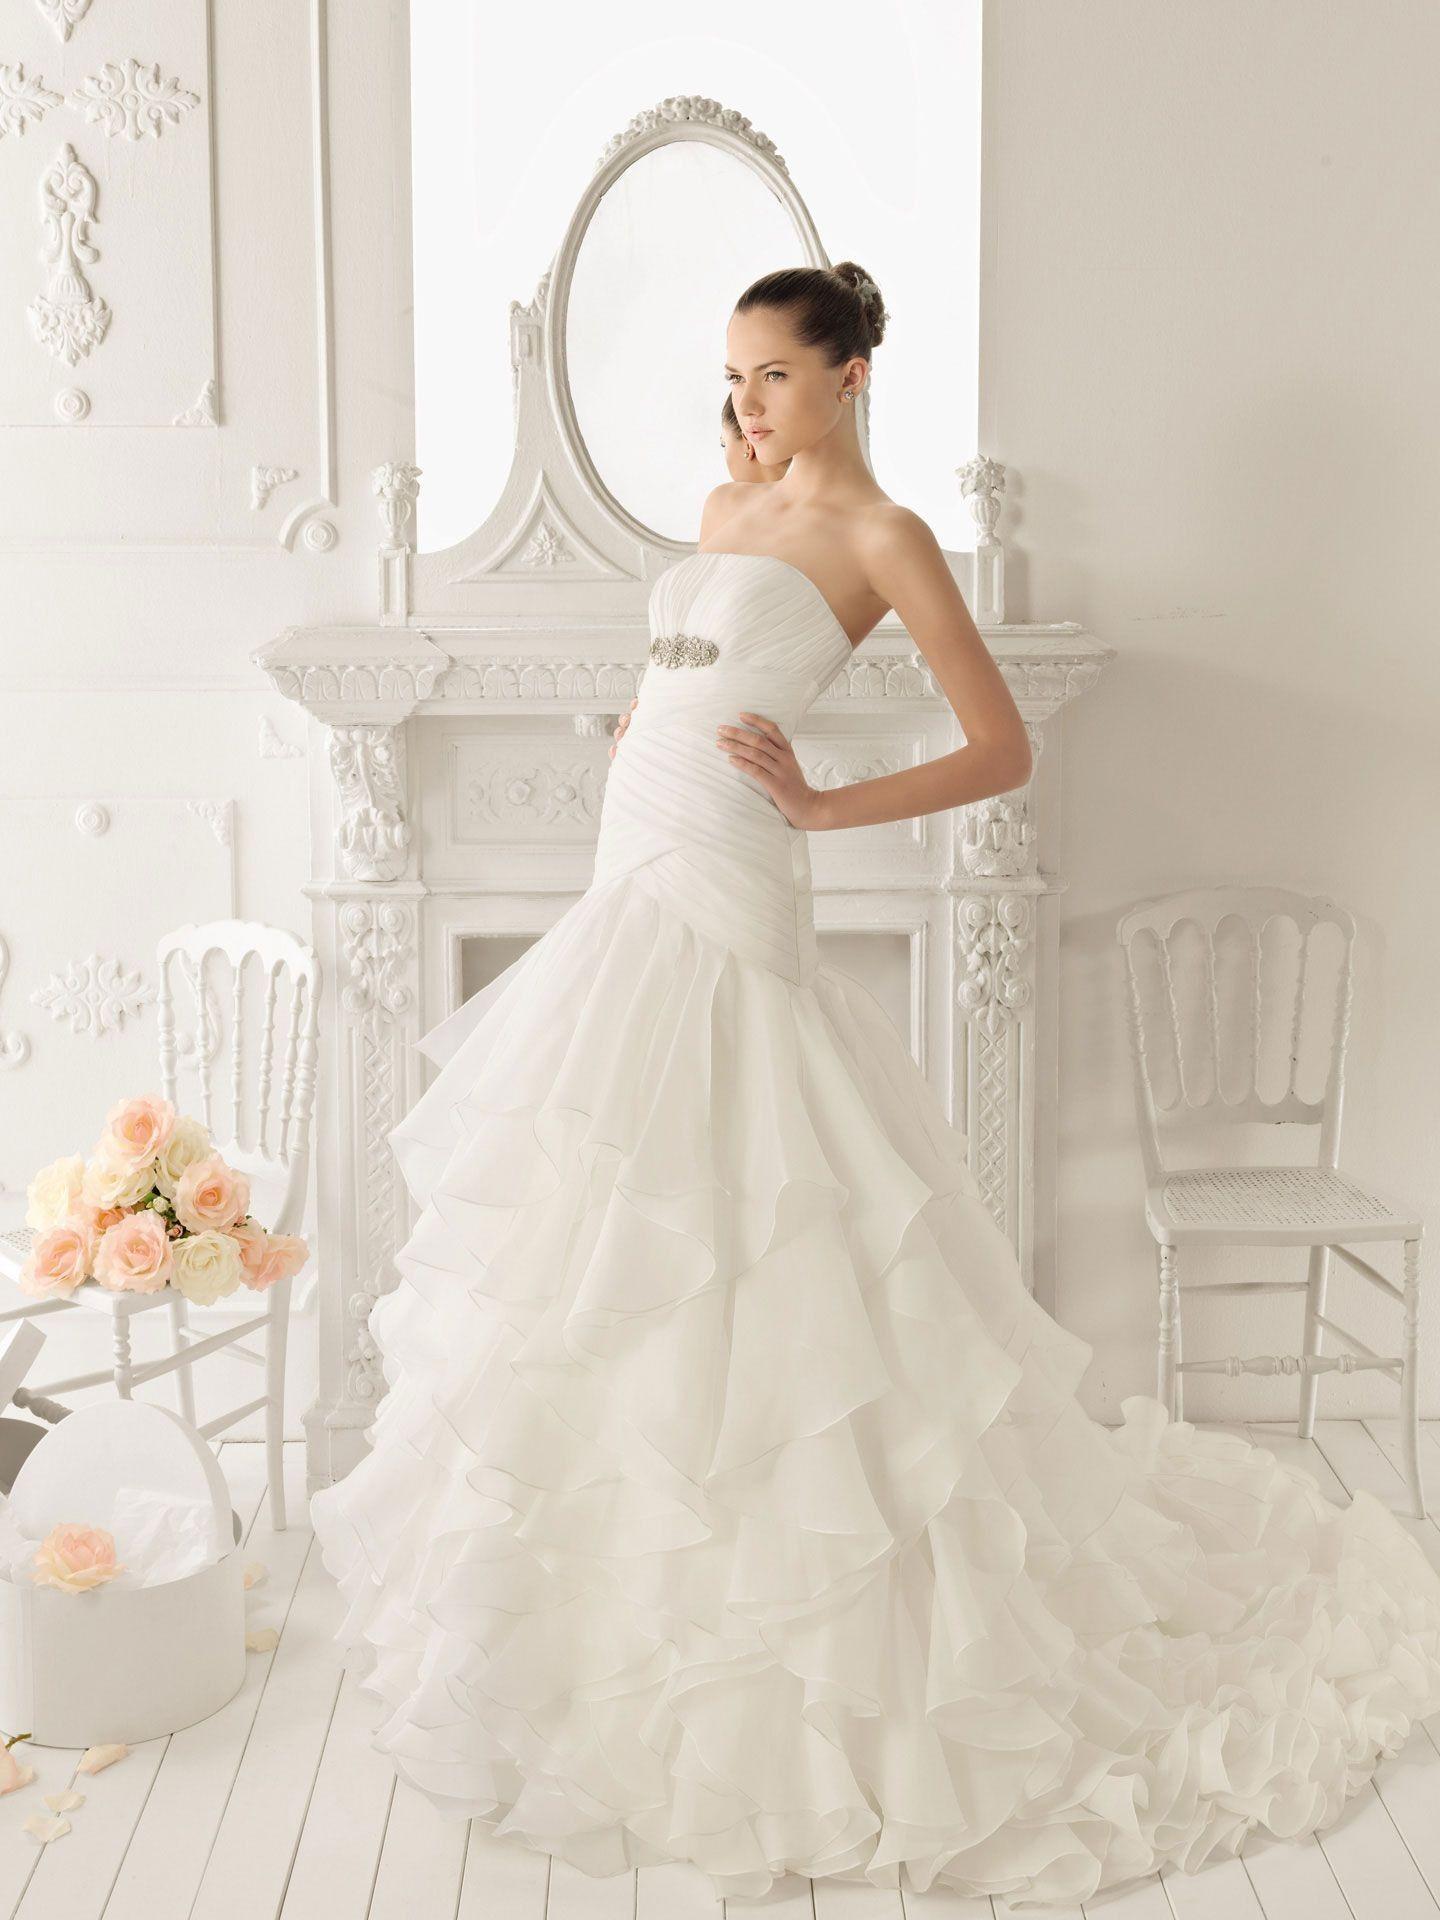 Fancy Organza Strapless A Line Style with Lavish Ruffle Skirt Wedding Dress Bupop